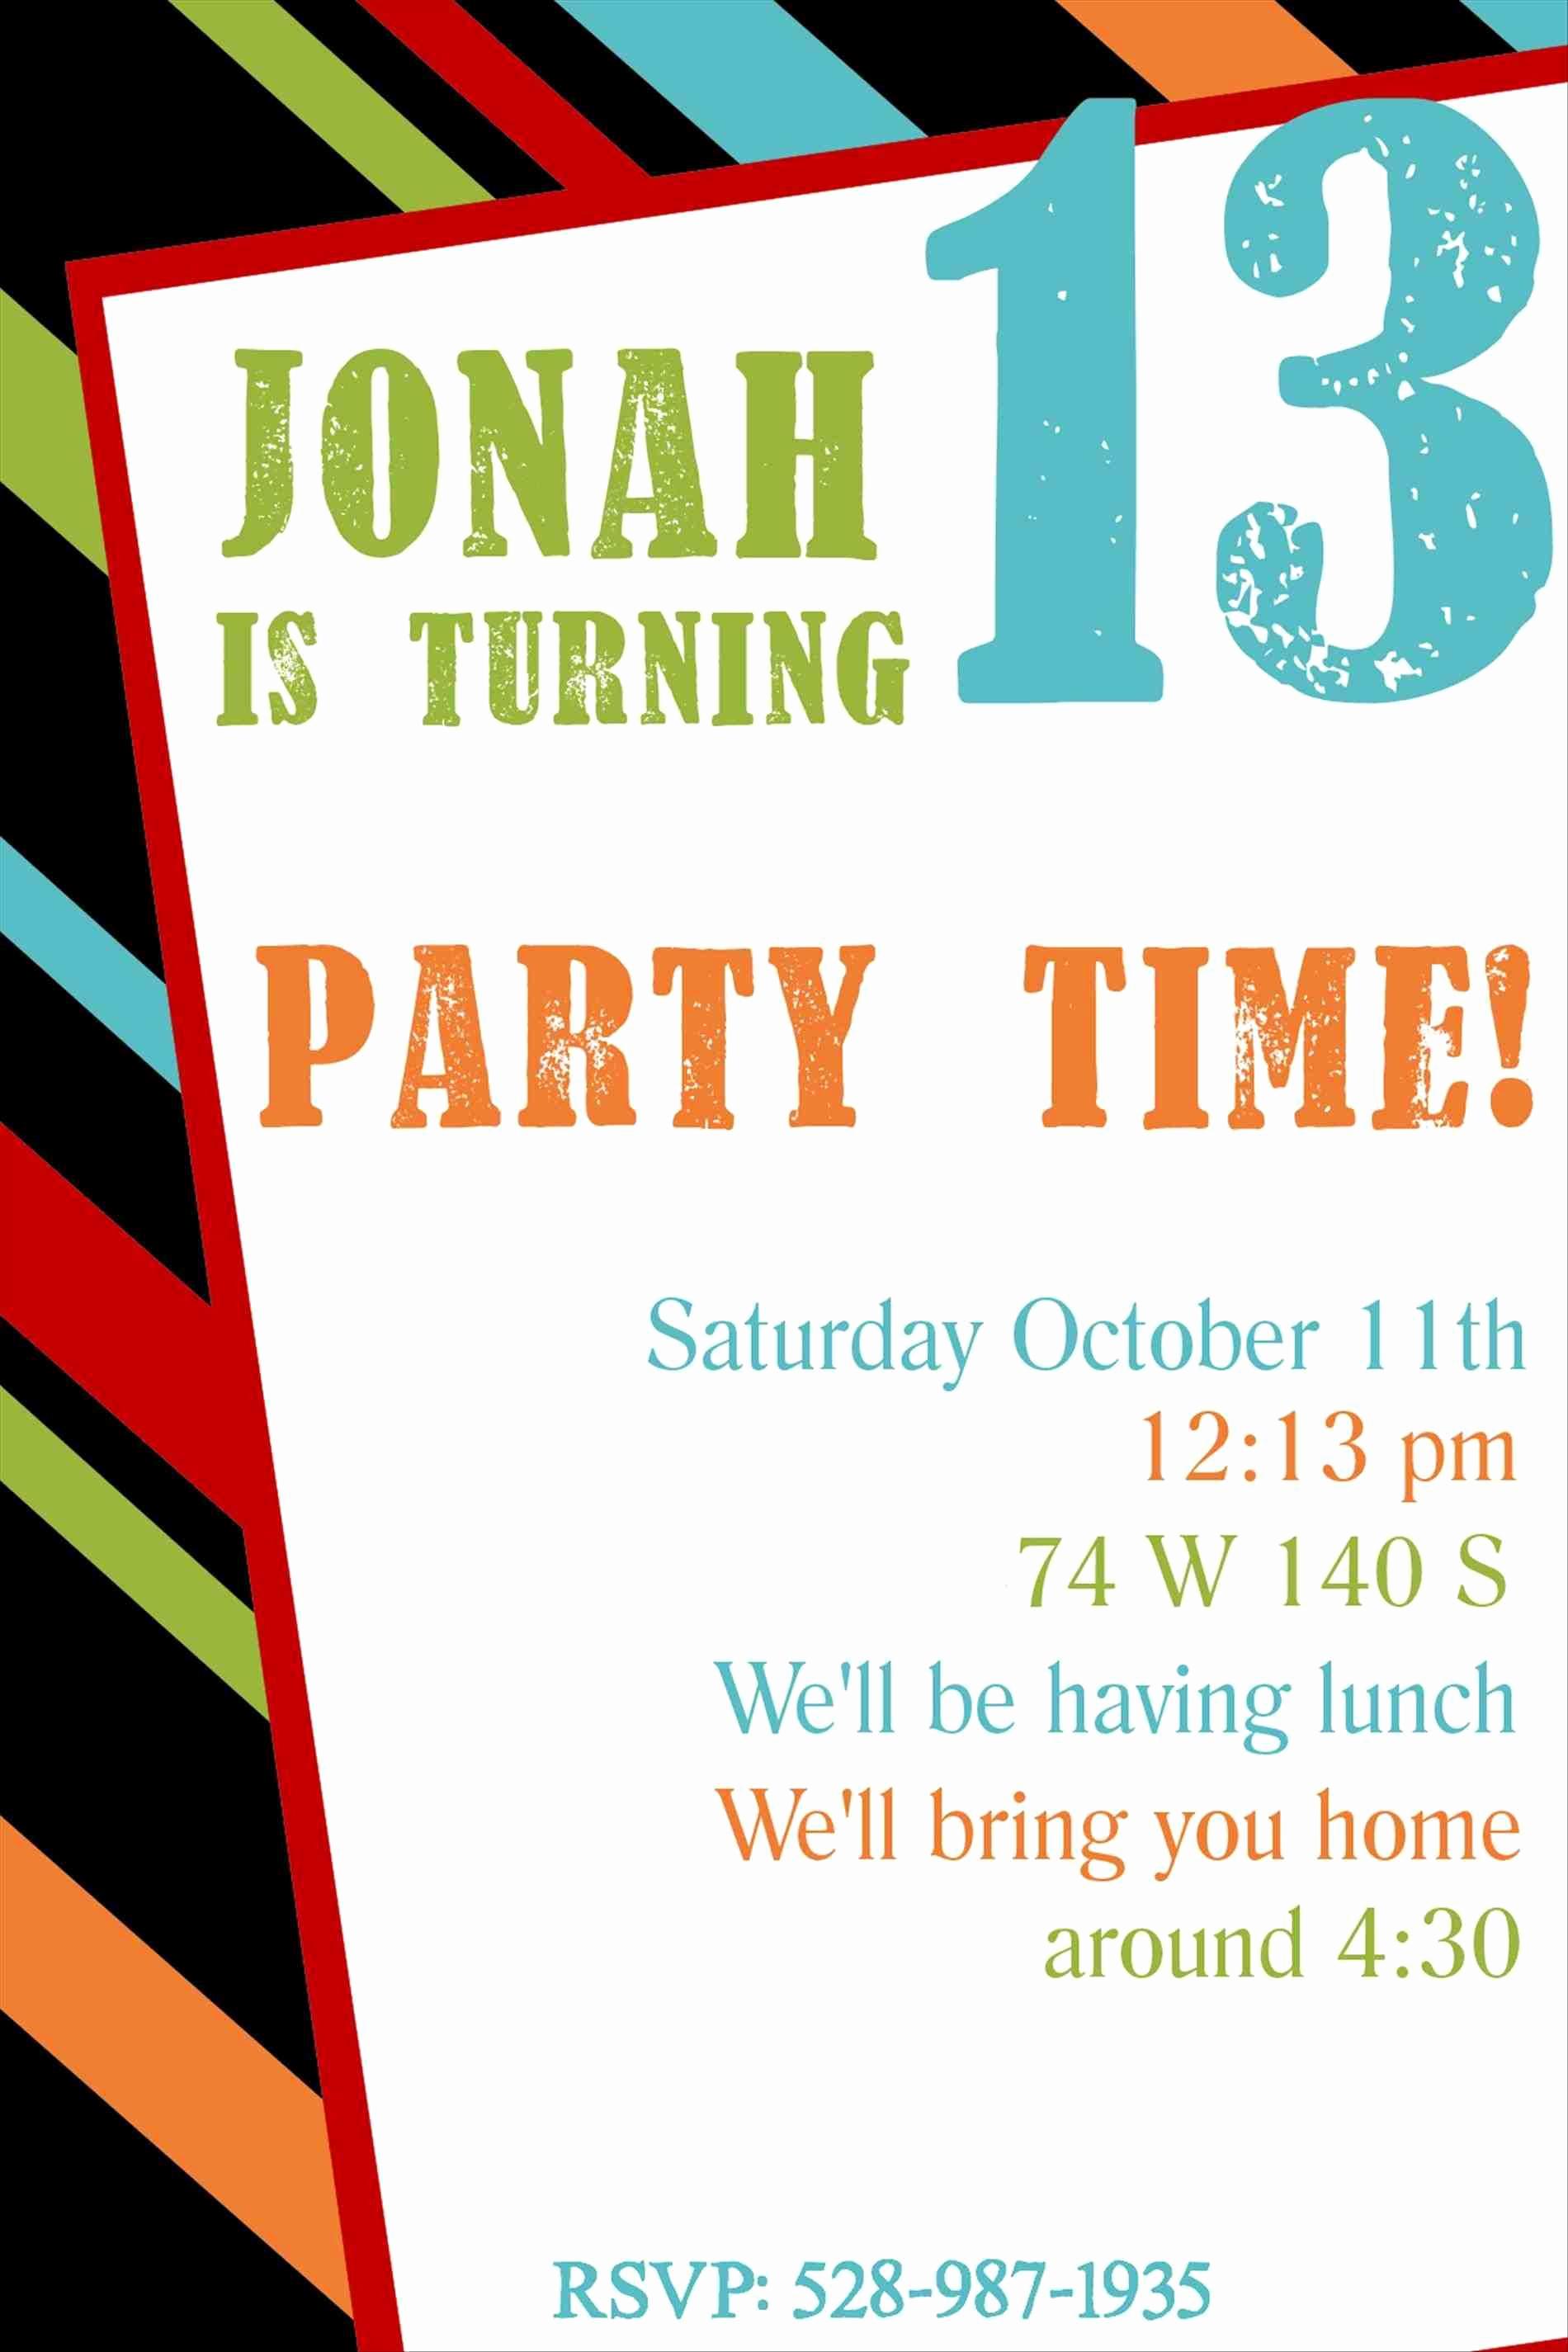 Free Printable Birthday Invitation Templates Inspirational Full Size Of Template Free Printable Kids Birthday Party